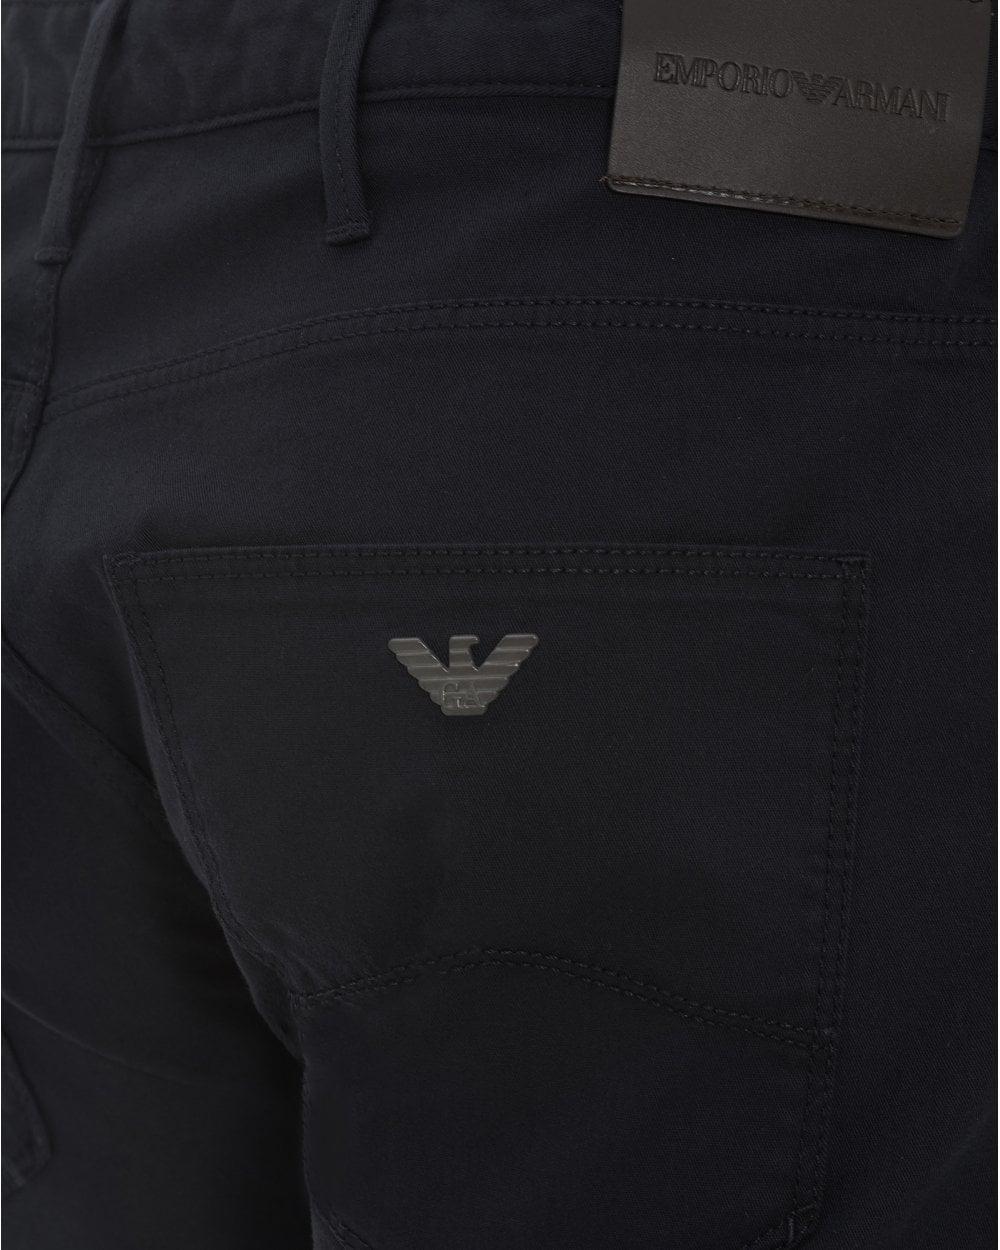 53ea36d9fb Mens J06 Navy Gabardine Jeans, Slim Fit Stretch Cotton Denim